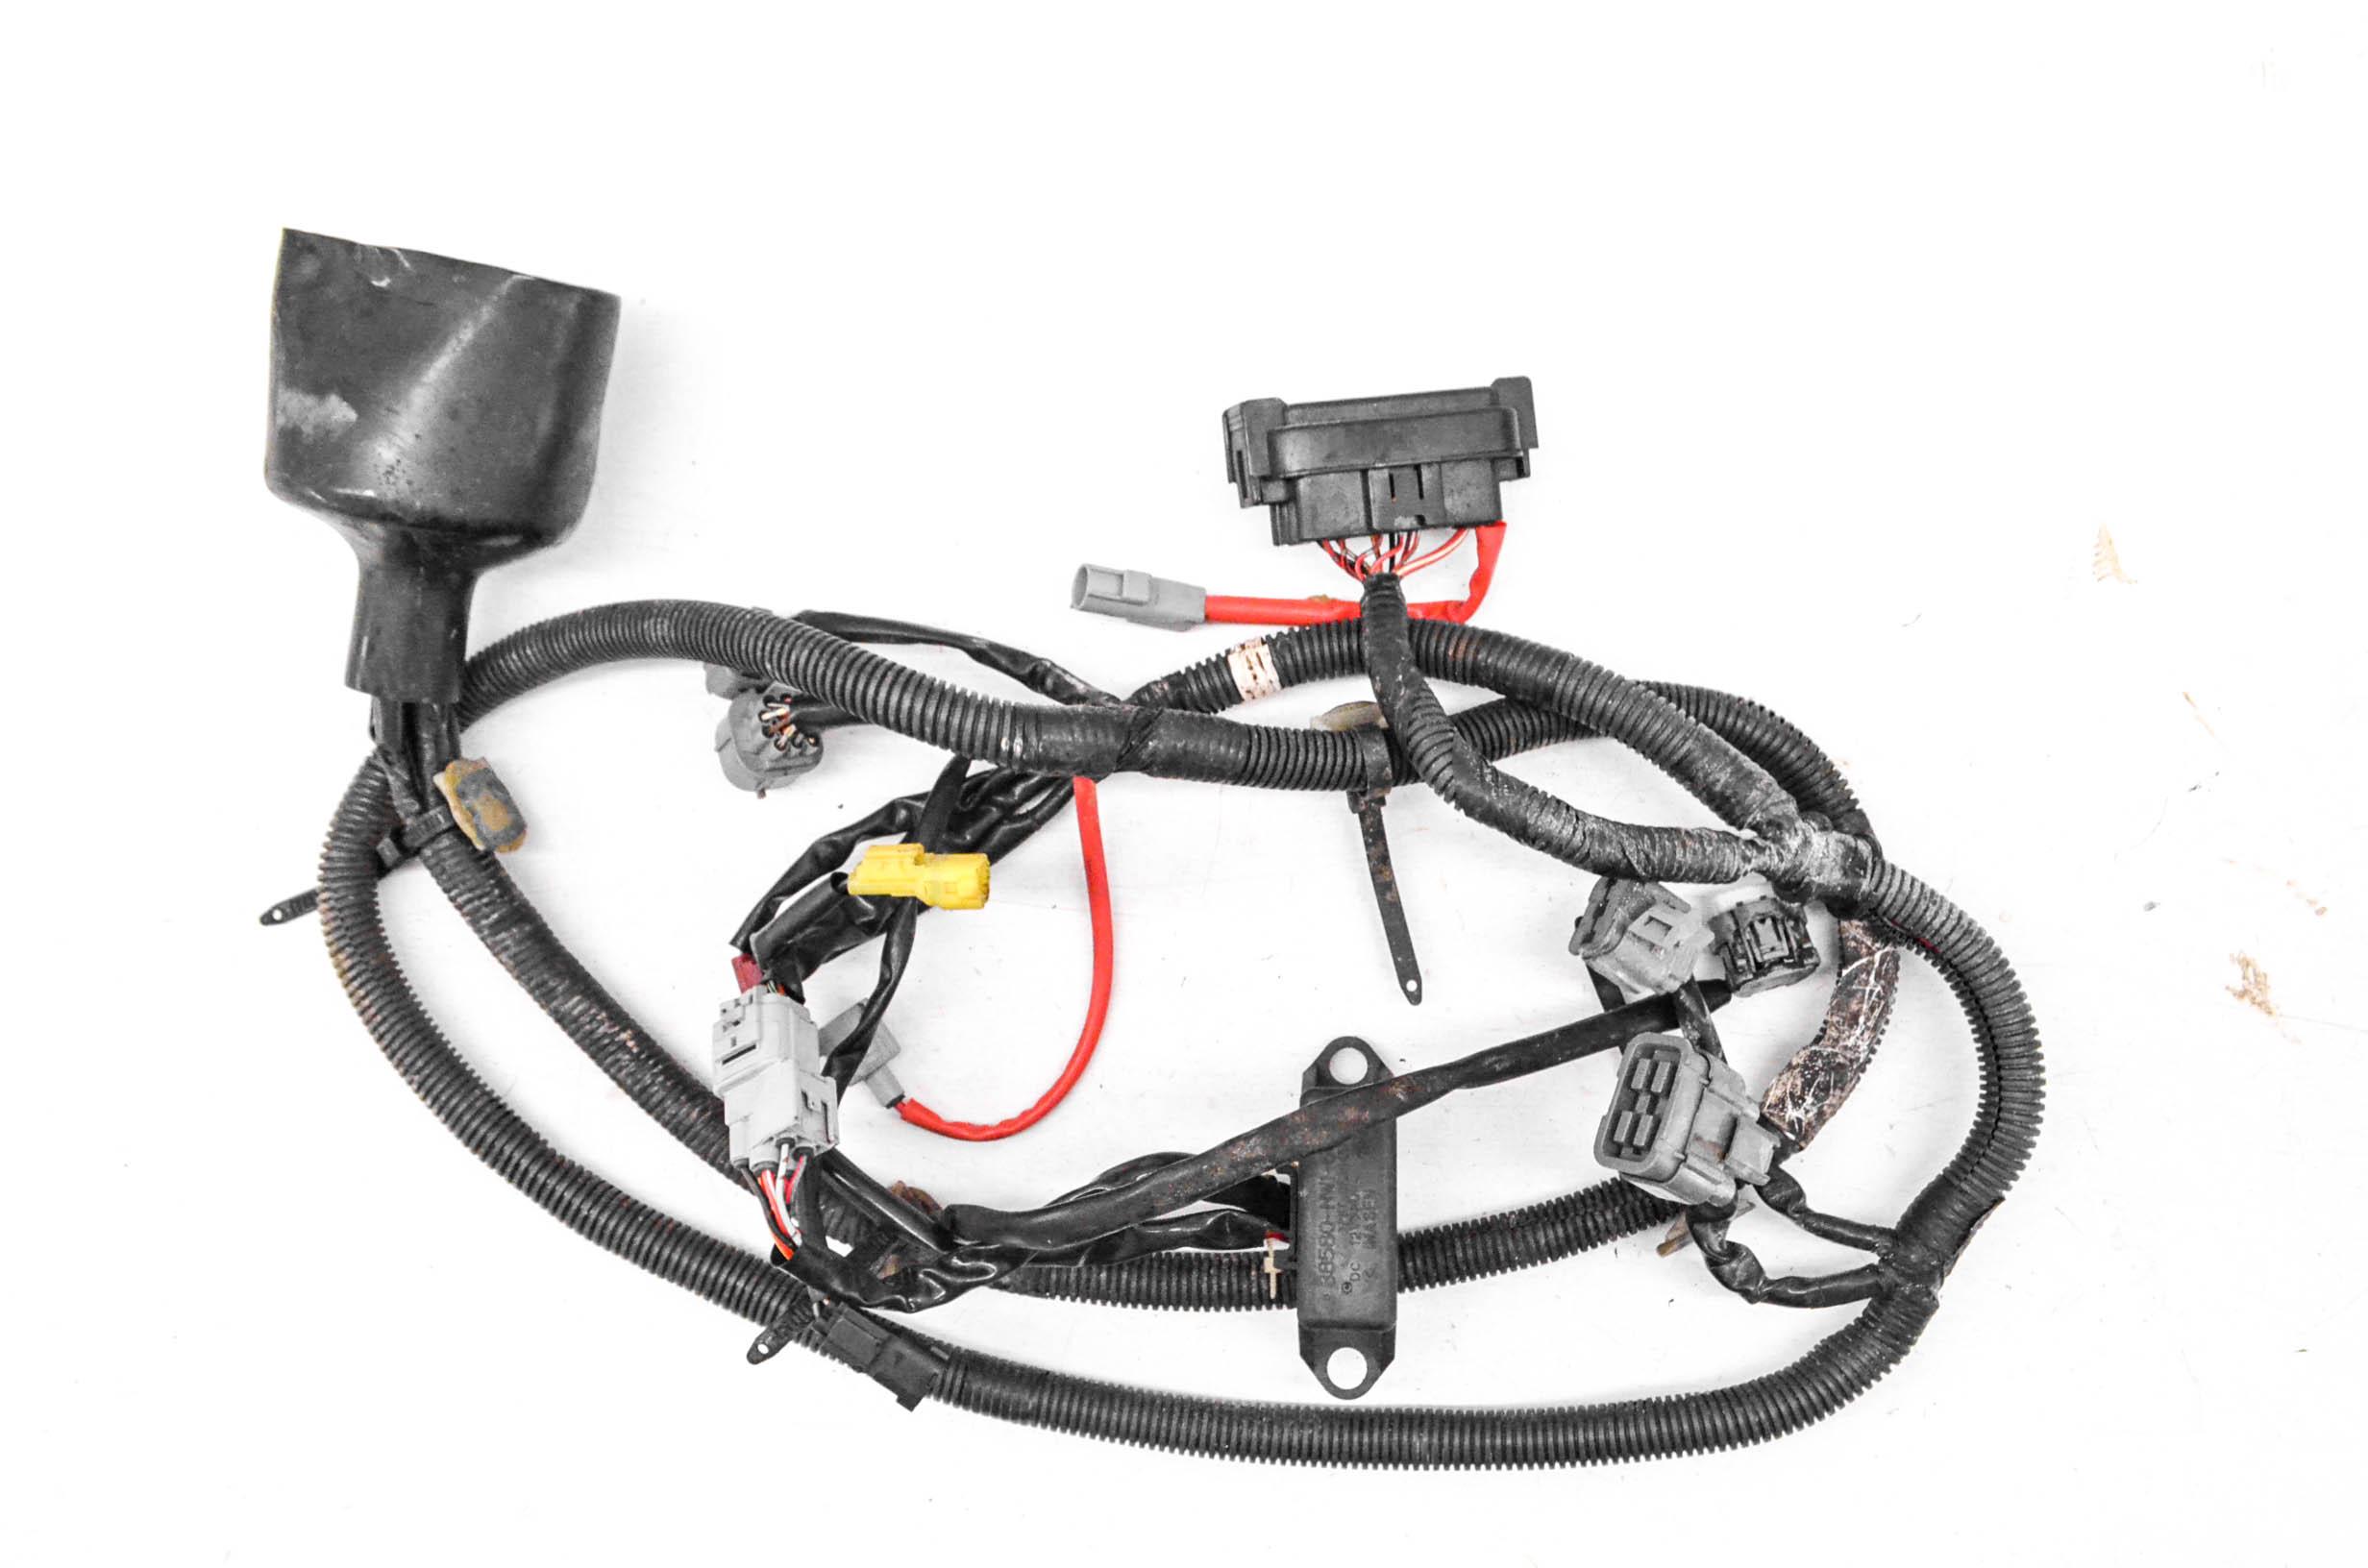 04 Honda Aquatrax F 12x Main Wire Harness Electrical